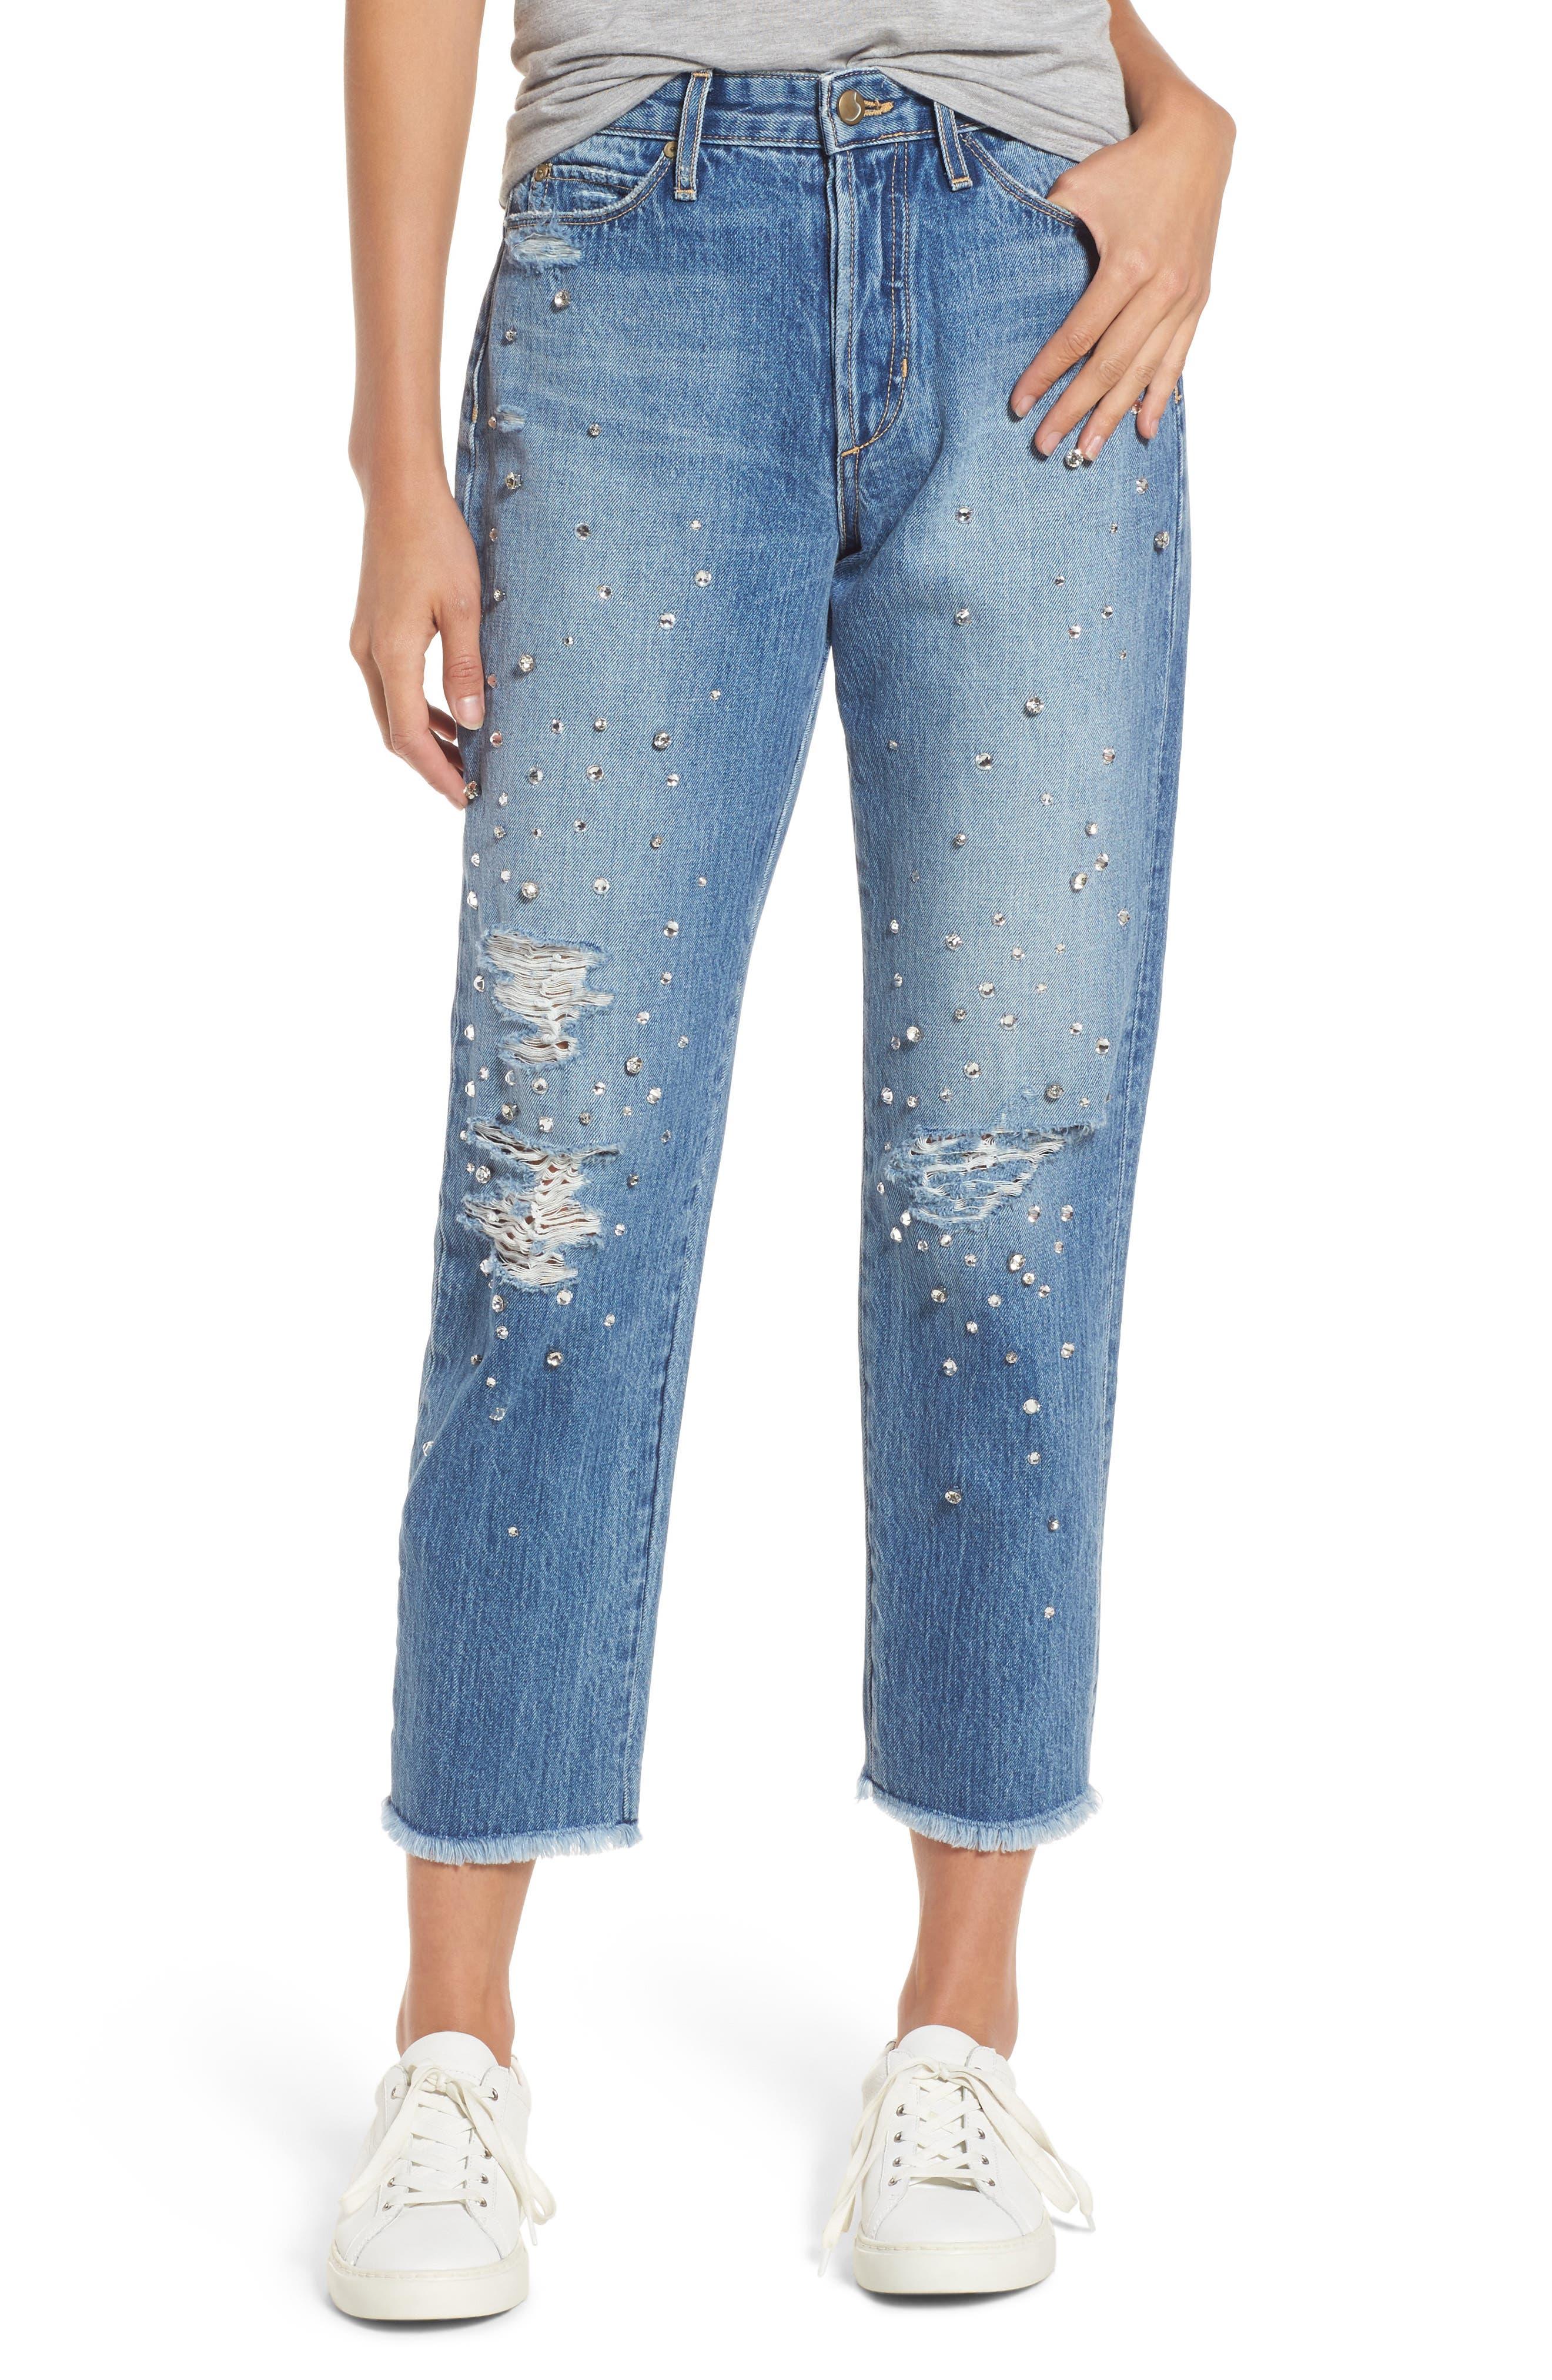 Jeans Smith Rhinestone Crop Boyfriend Jeans,                         Main,                         color, 450